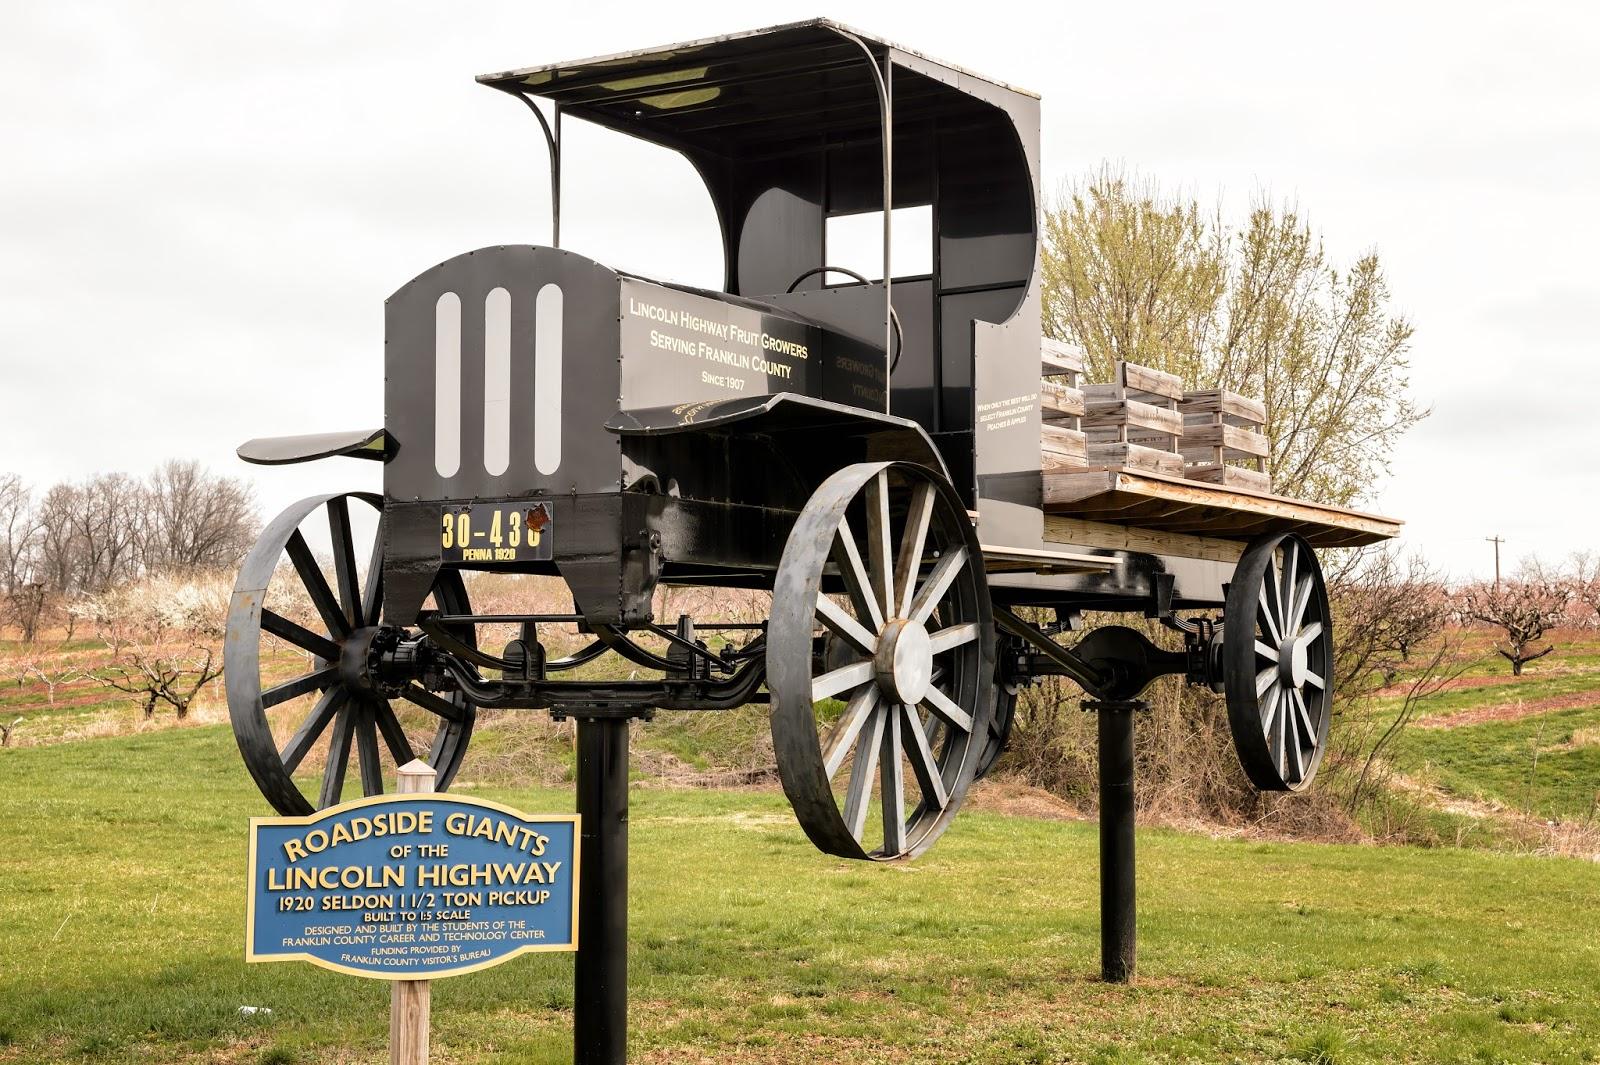 Lincoln Highway Roadside Giant - 1920 Seldon 1 1/2 Ton Pickup